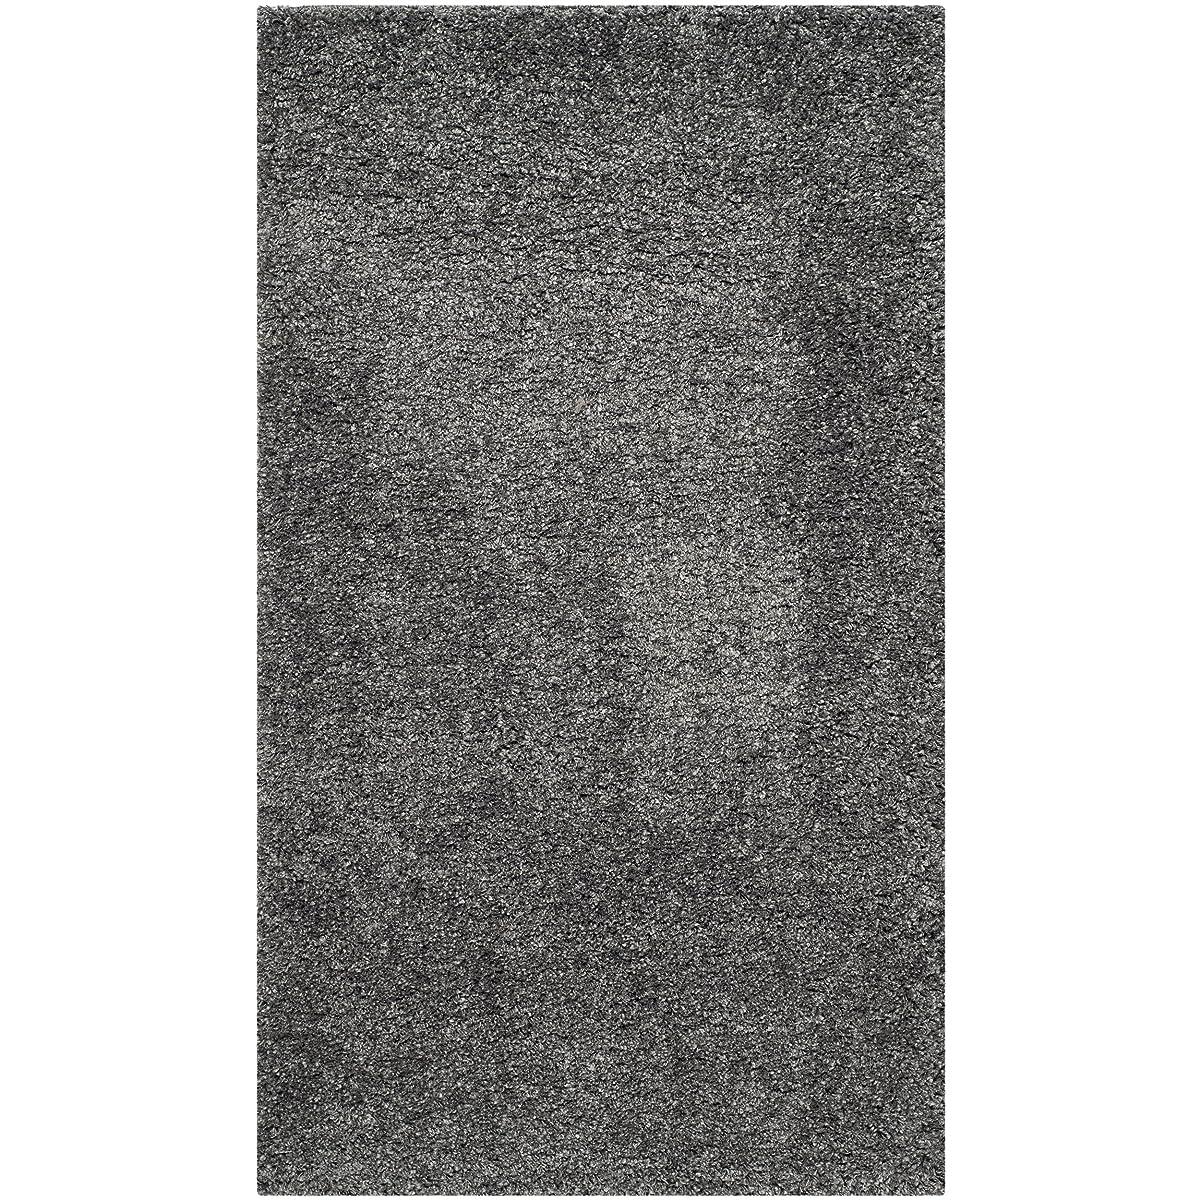 Safavieh California Shag Collection SG151-8484 Dark Grey Area Rug (8 x 10)